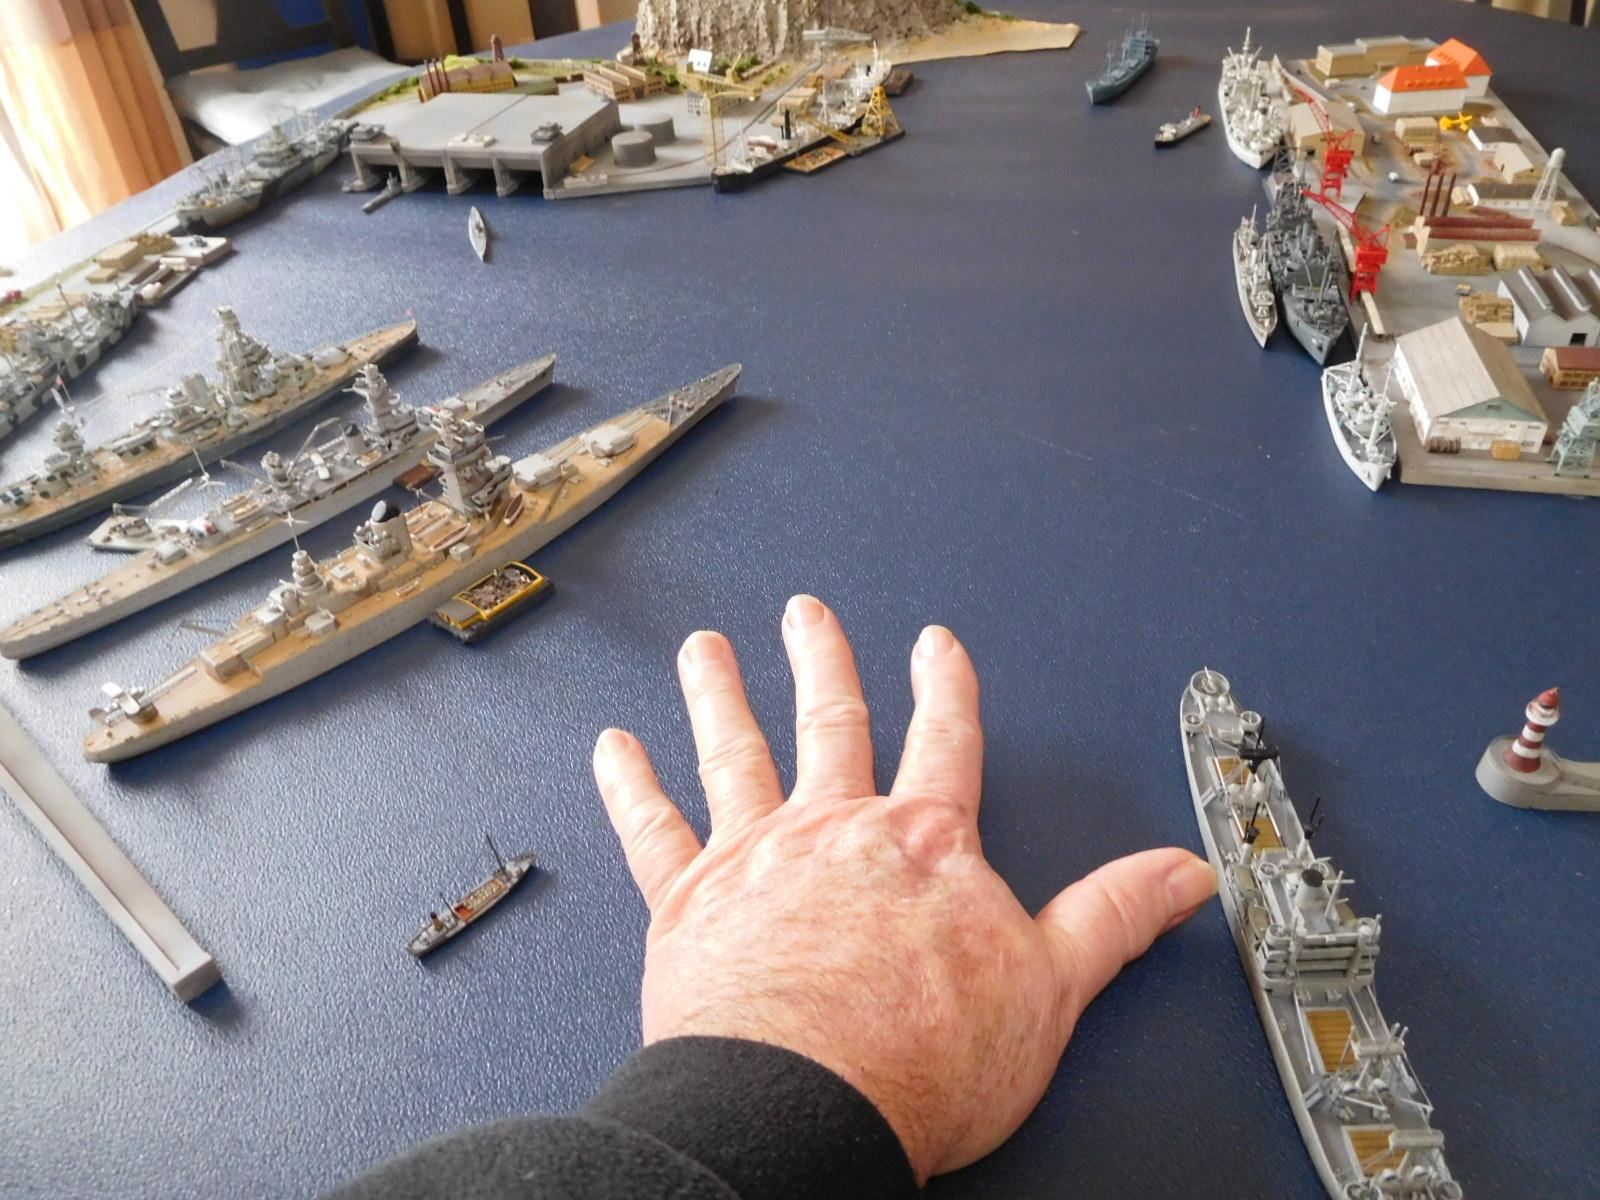 Diorama base navale 1/700 par Nesquik - Page 4 LyaG9